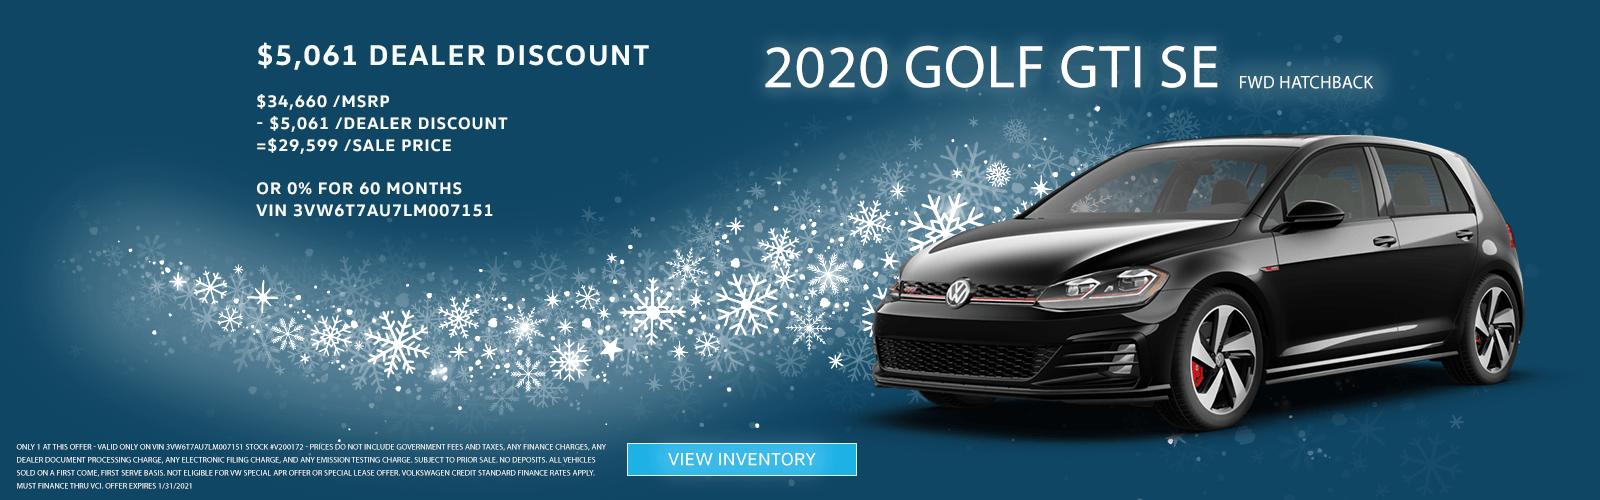 Golf GTI – SC Jan